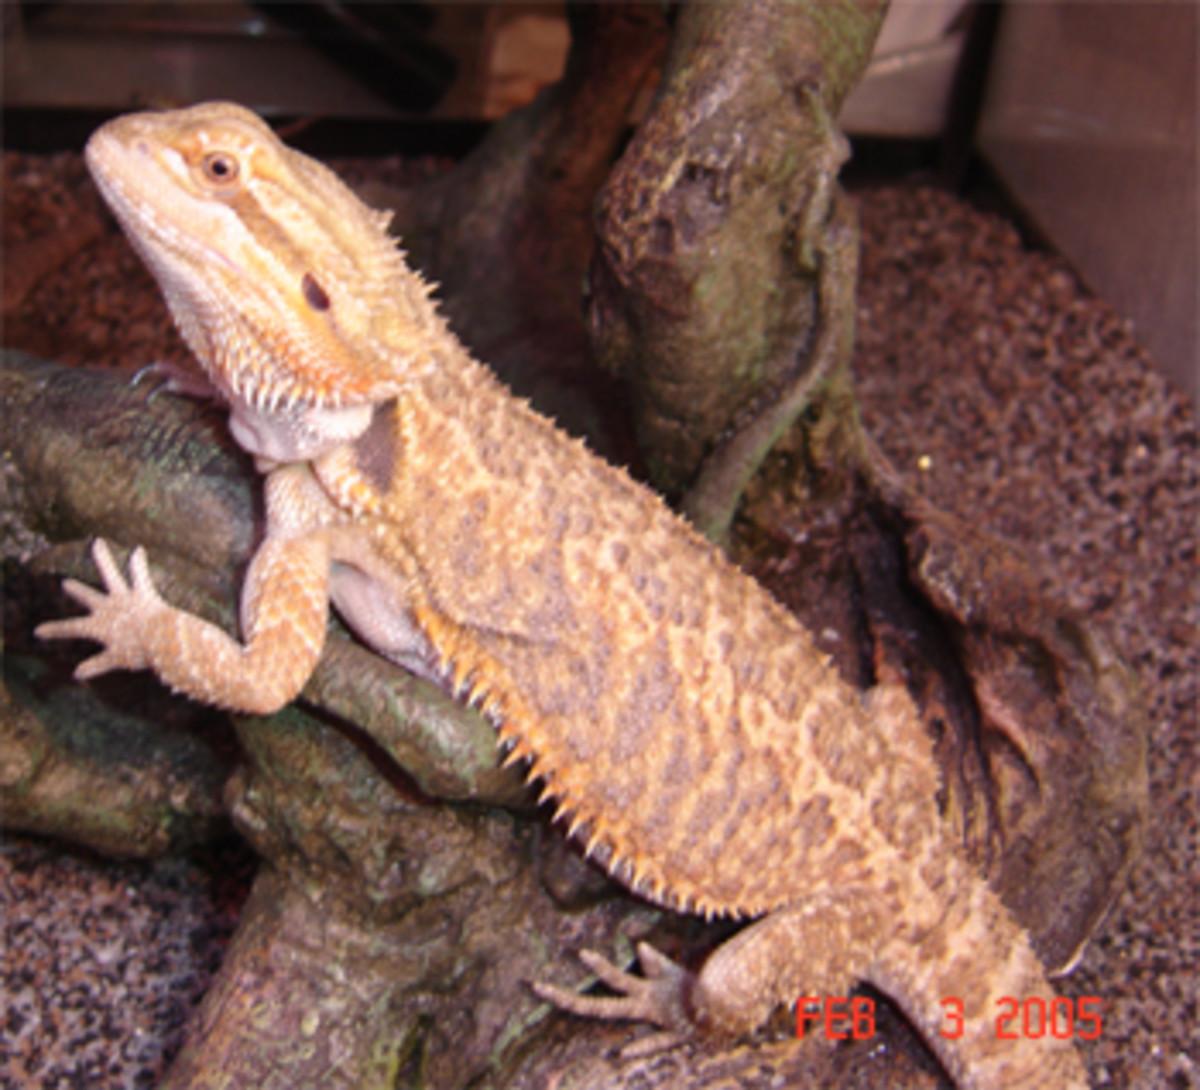 Female peach bearded dragon